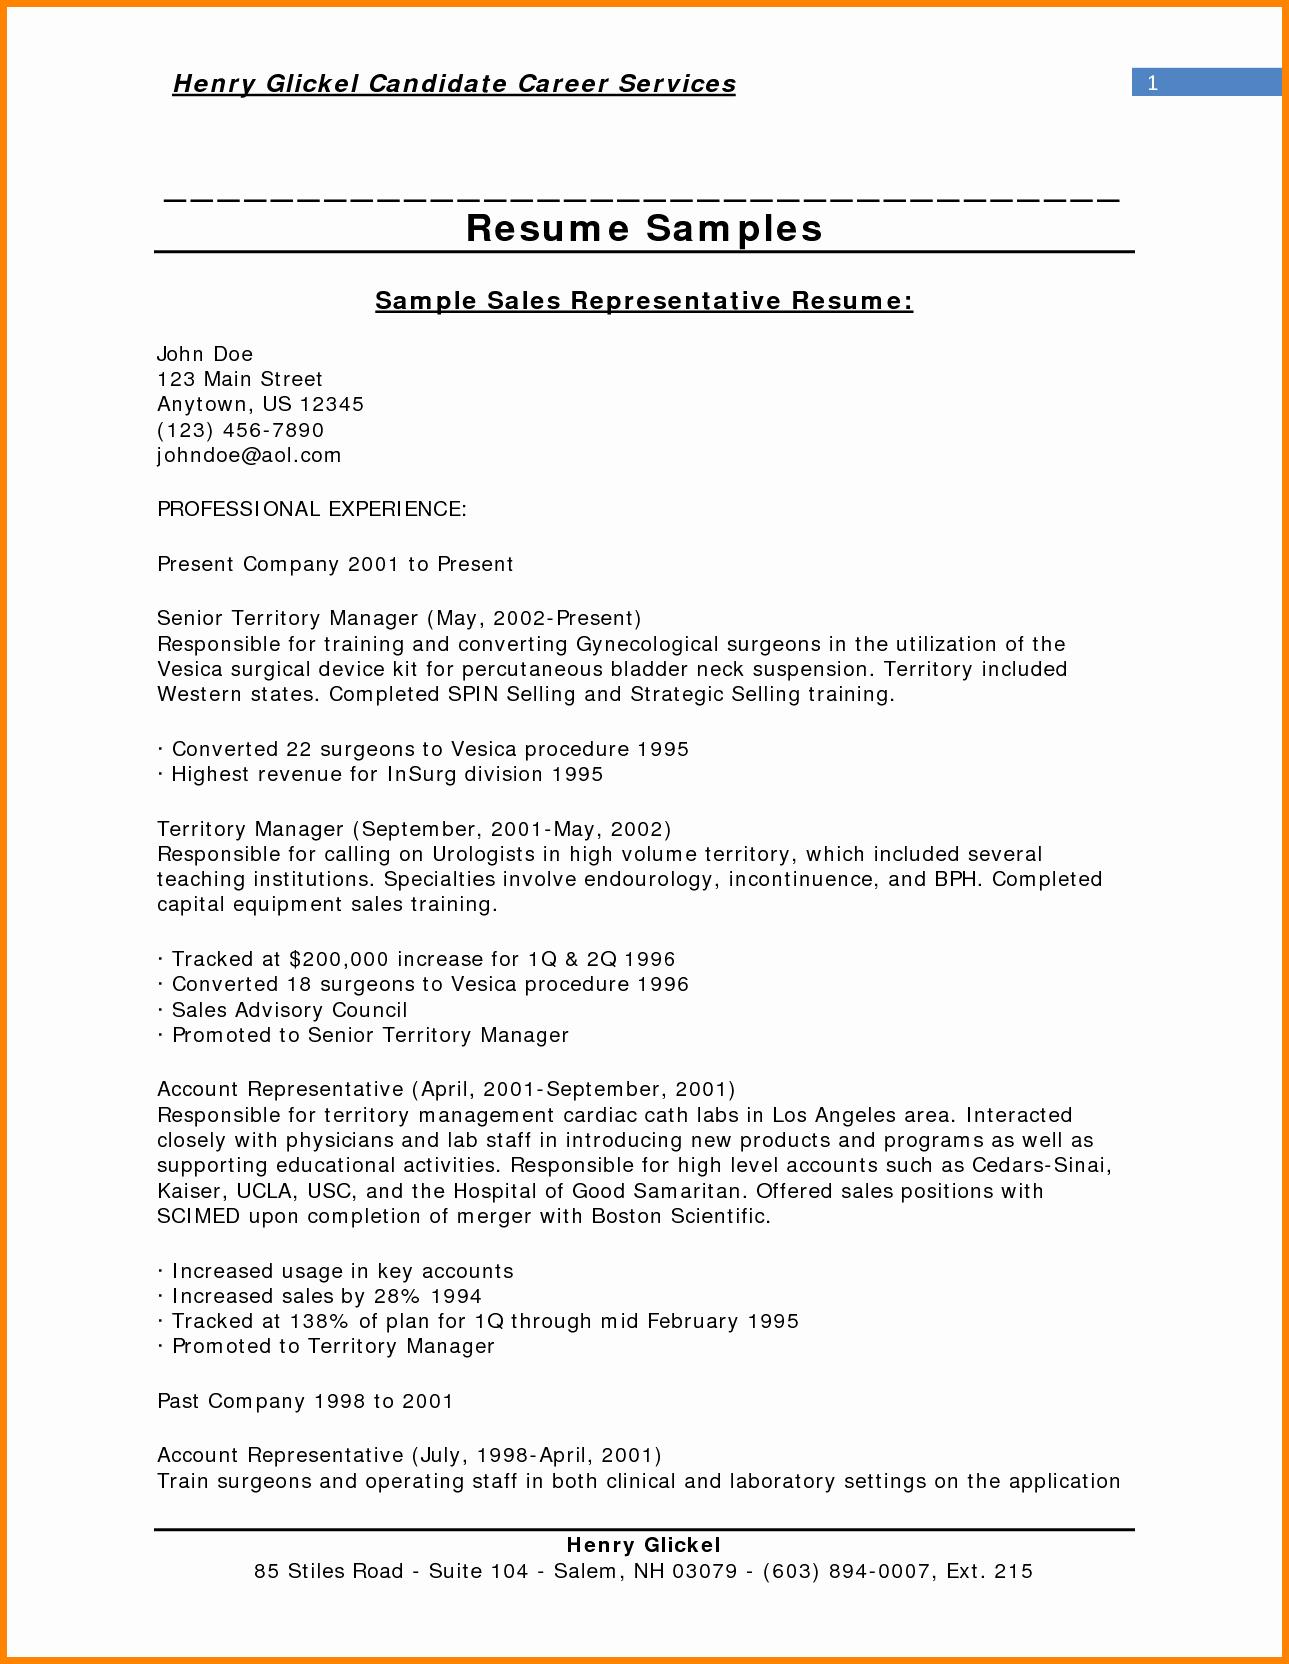 Resume for Sales Representative Jobs Sidemcicek